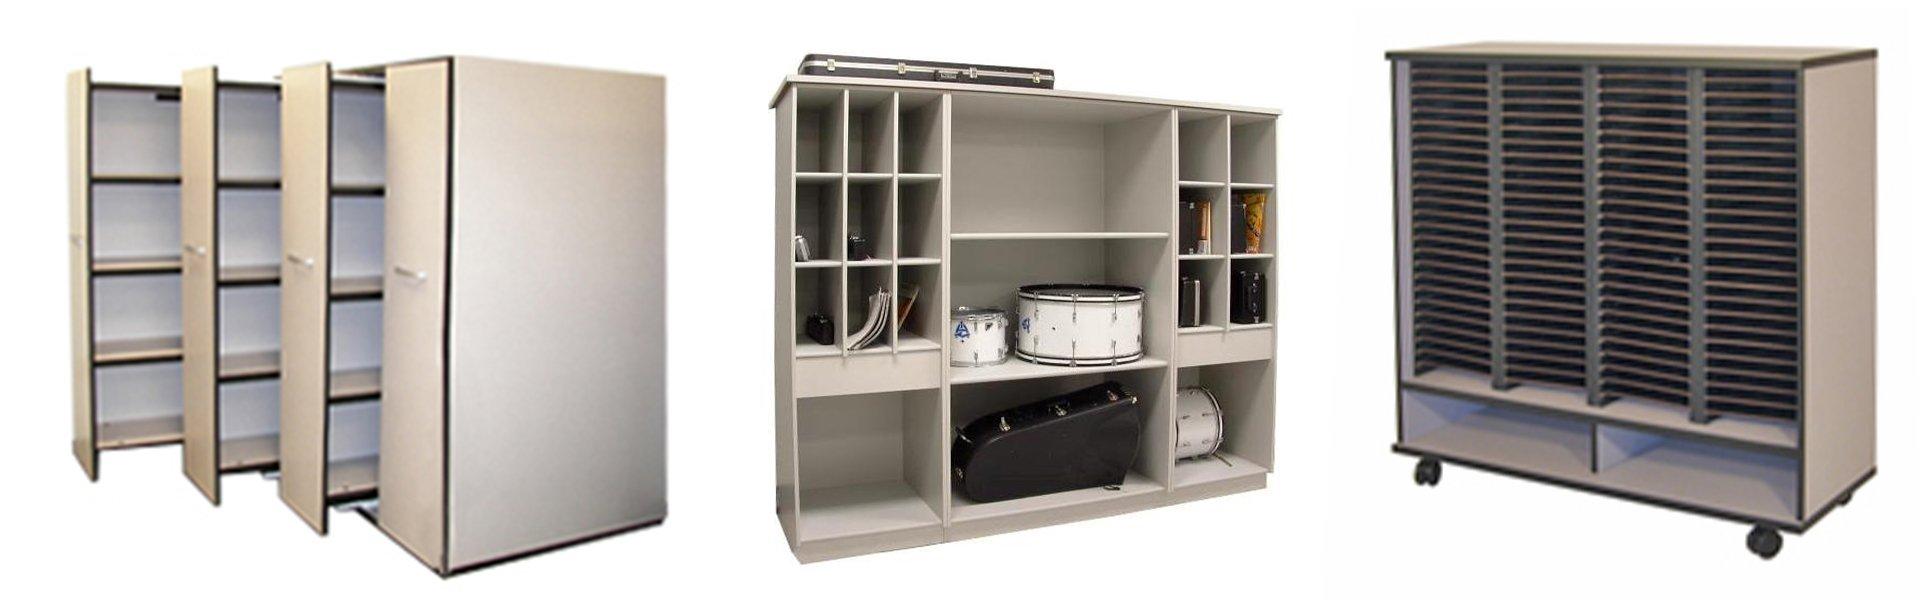 Corilam Music Cabinets B